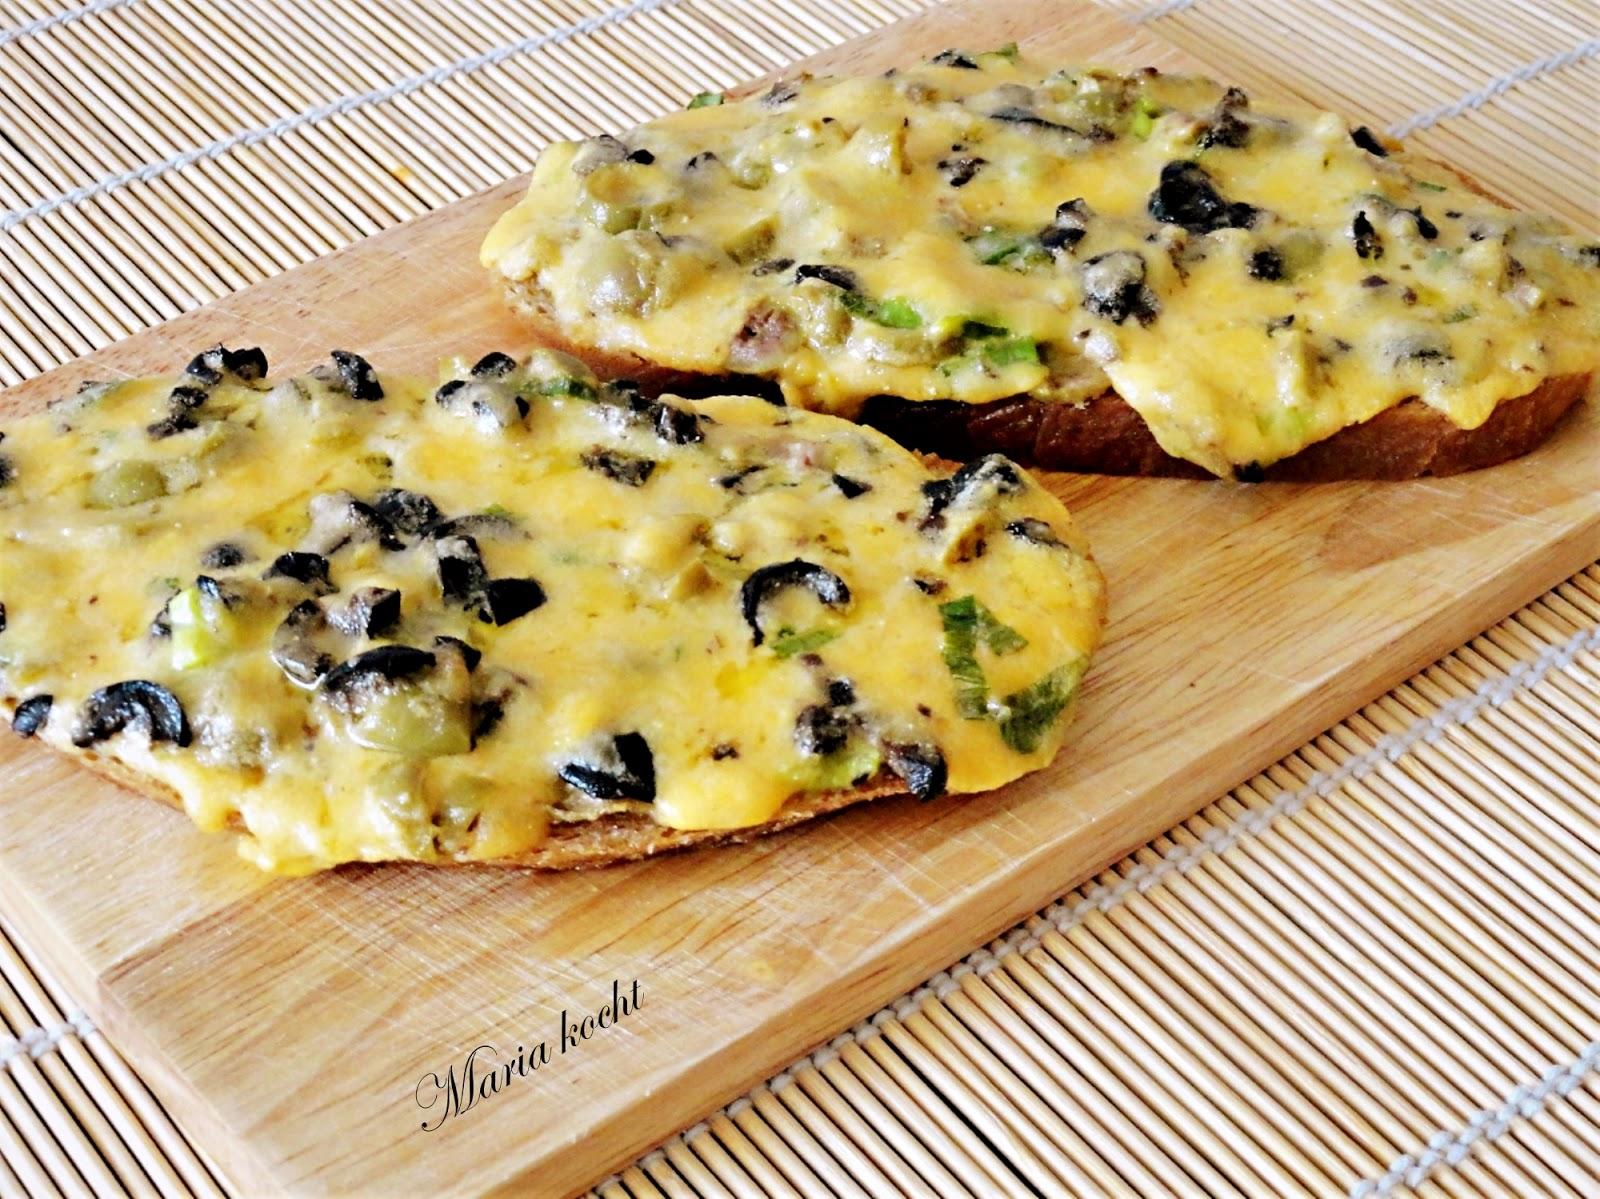 maria kocht mit k se und oliven berbackenes brot oliv s sajtos meleg szendvics. Black Bedroom Furniture Sets. Home Design Ideas